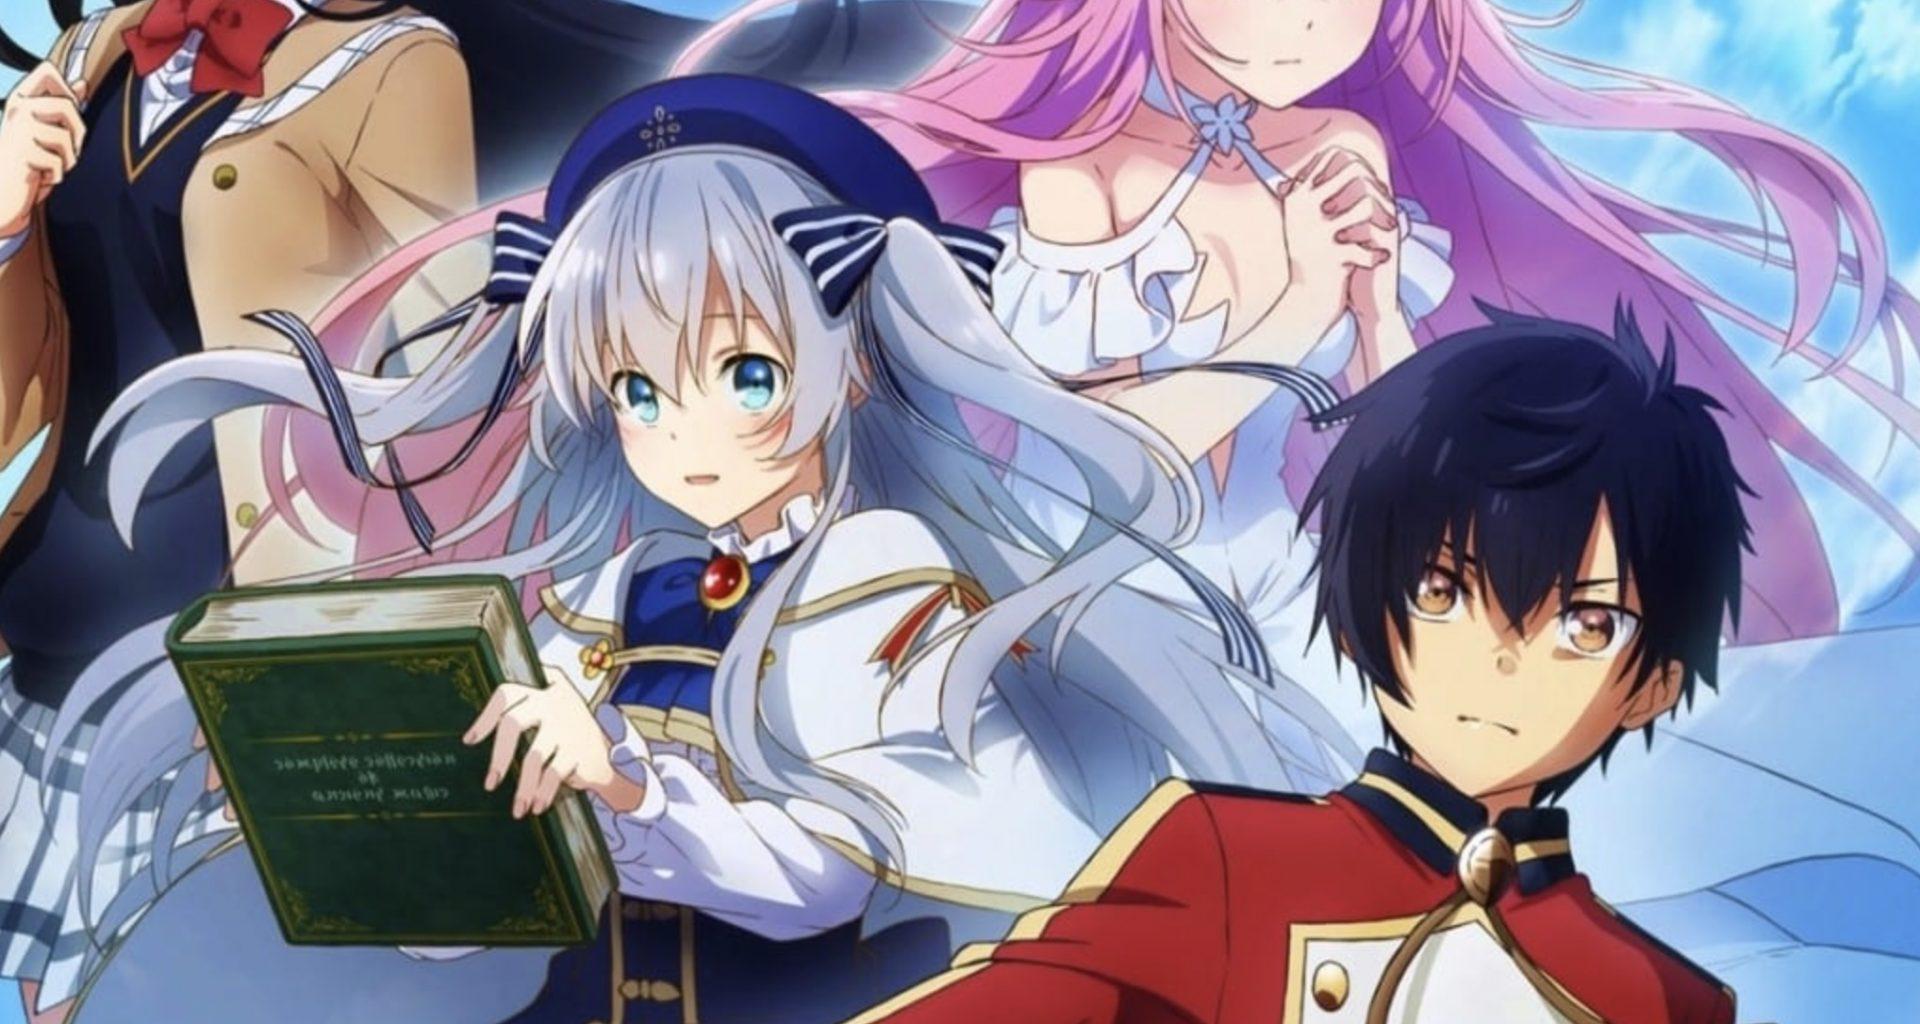 Seirei Gensouki Episode 10 Release Date